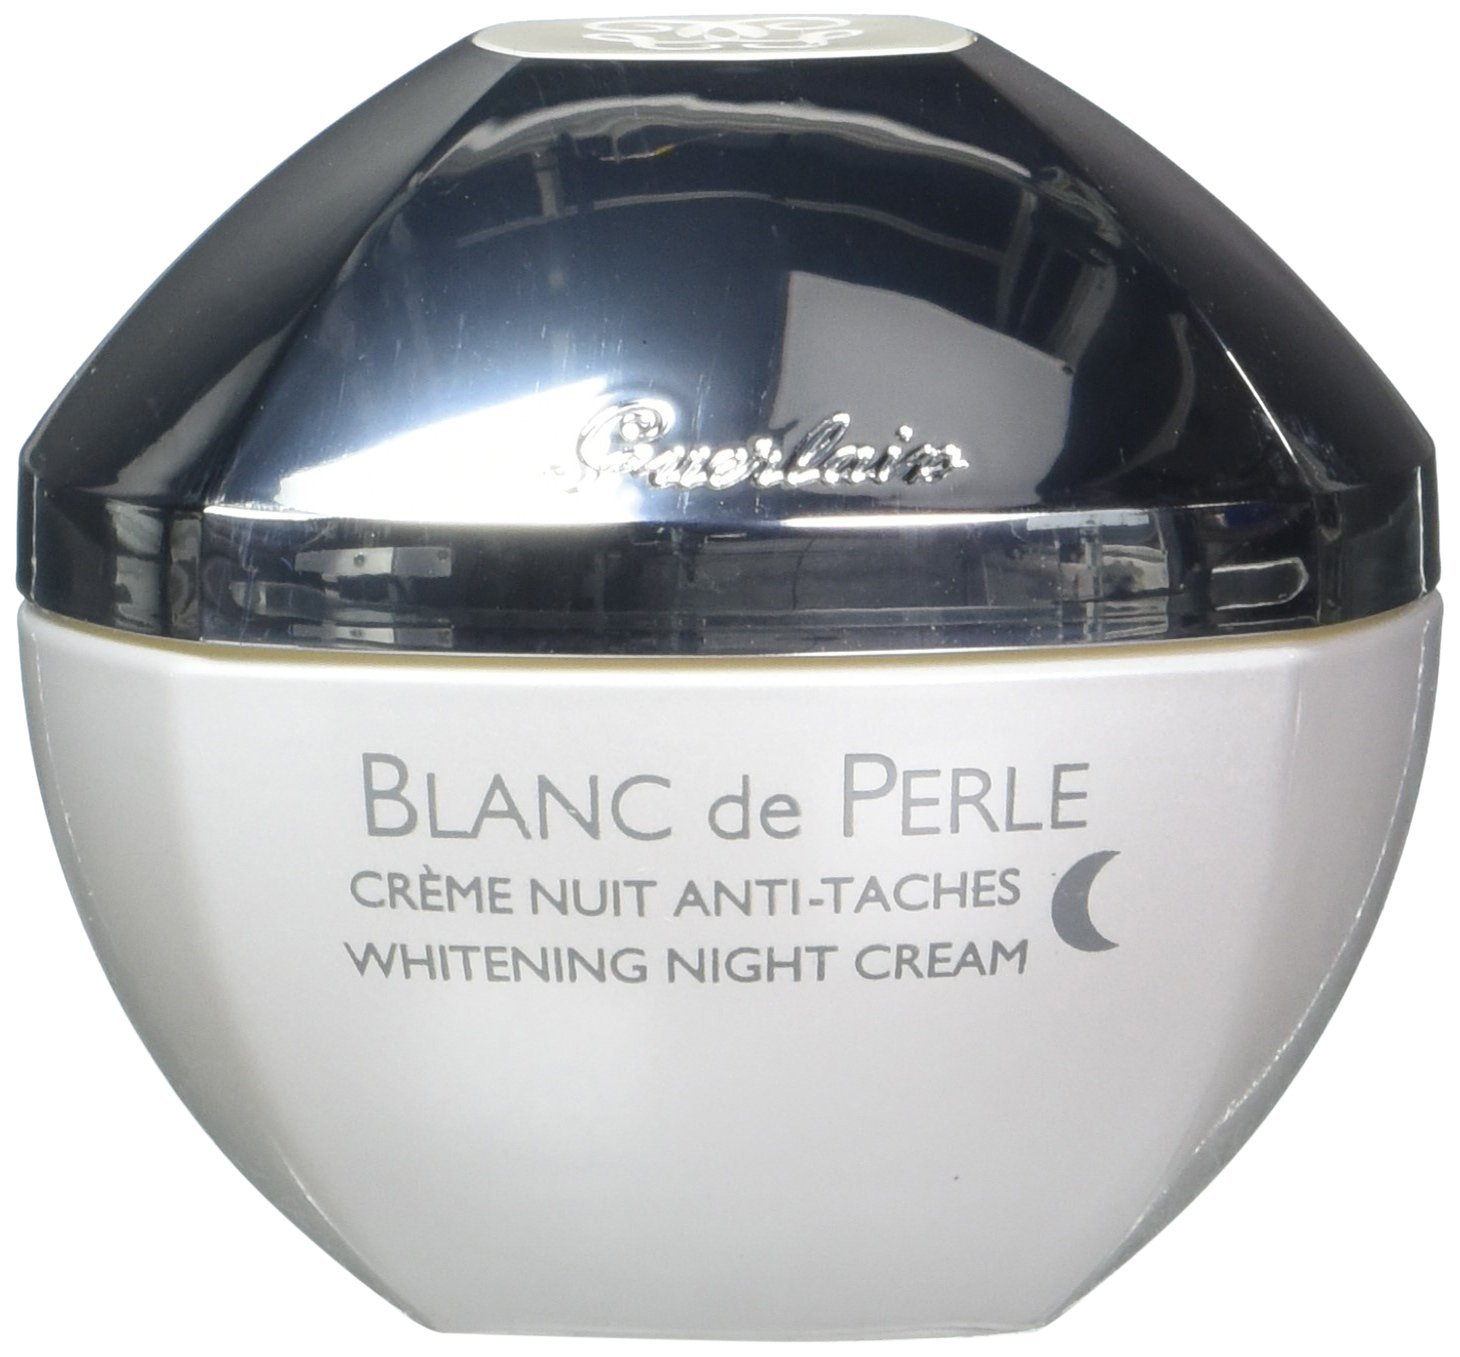 Guerlain Blanc De Perle Whitening Night Cream for Women, 1.6 Ounce